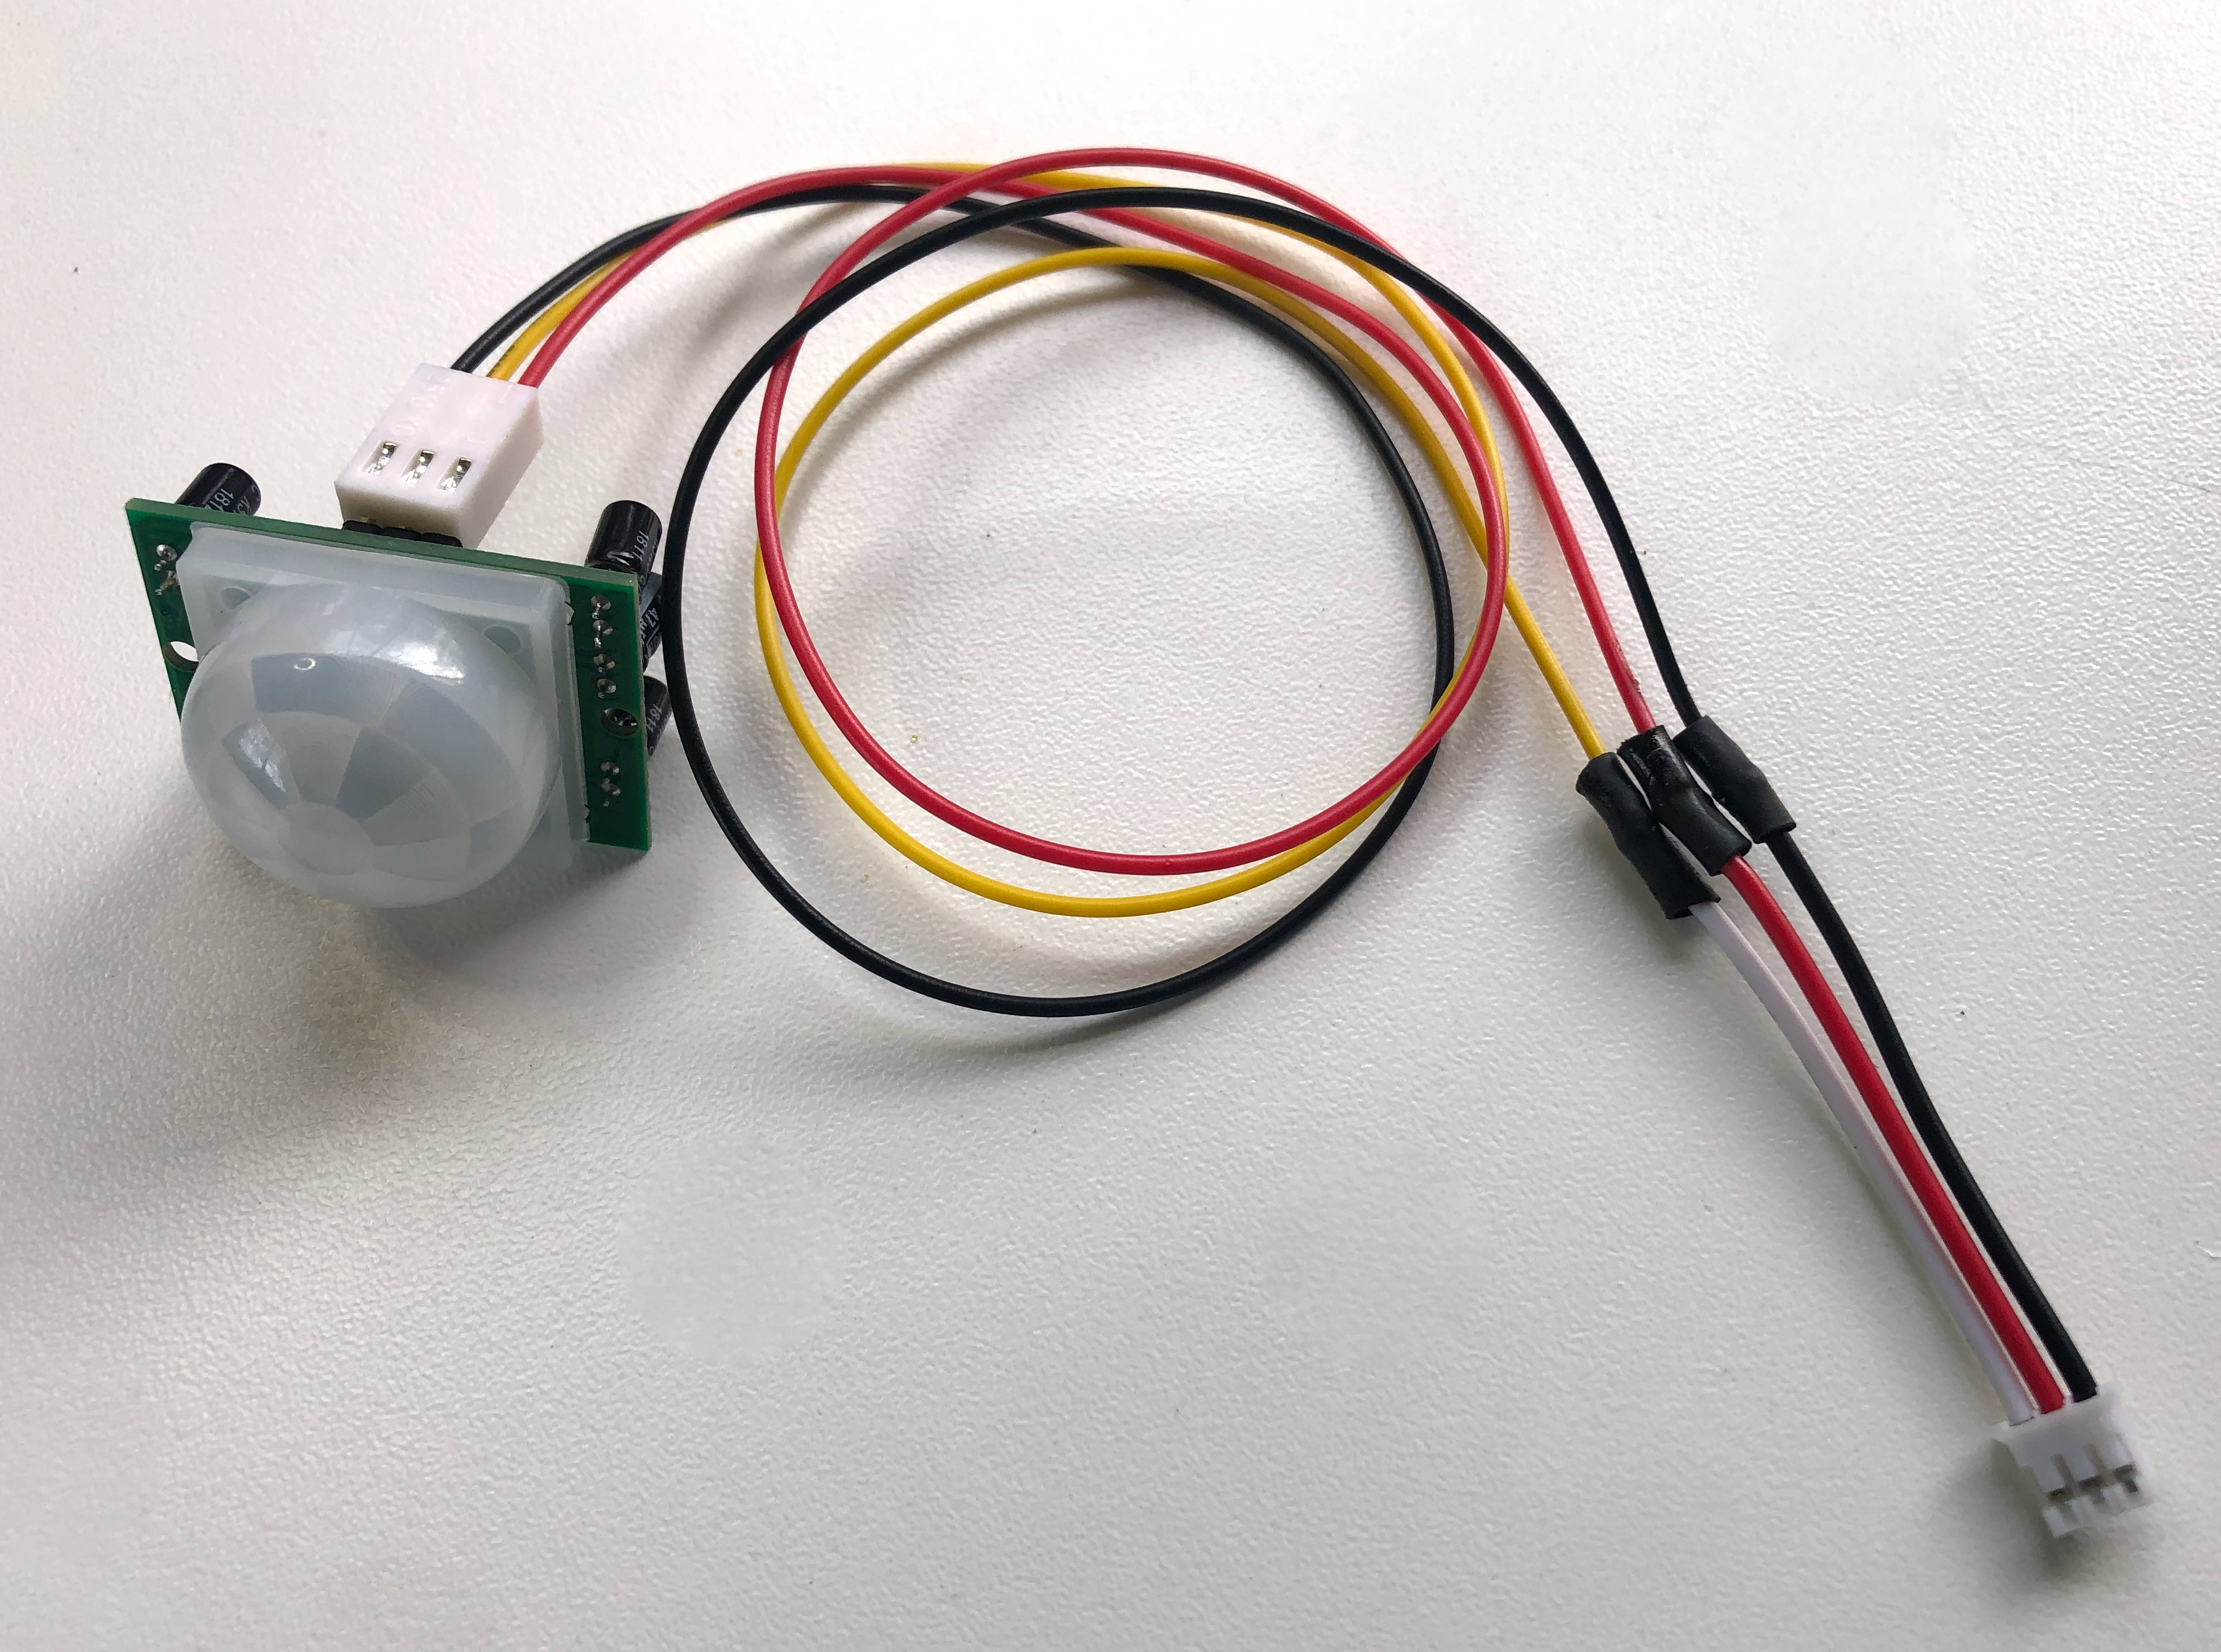 proximity_sensor_wired.jpeg